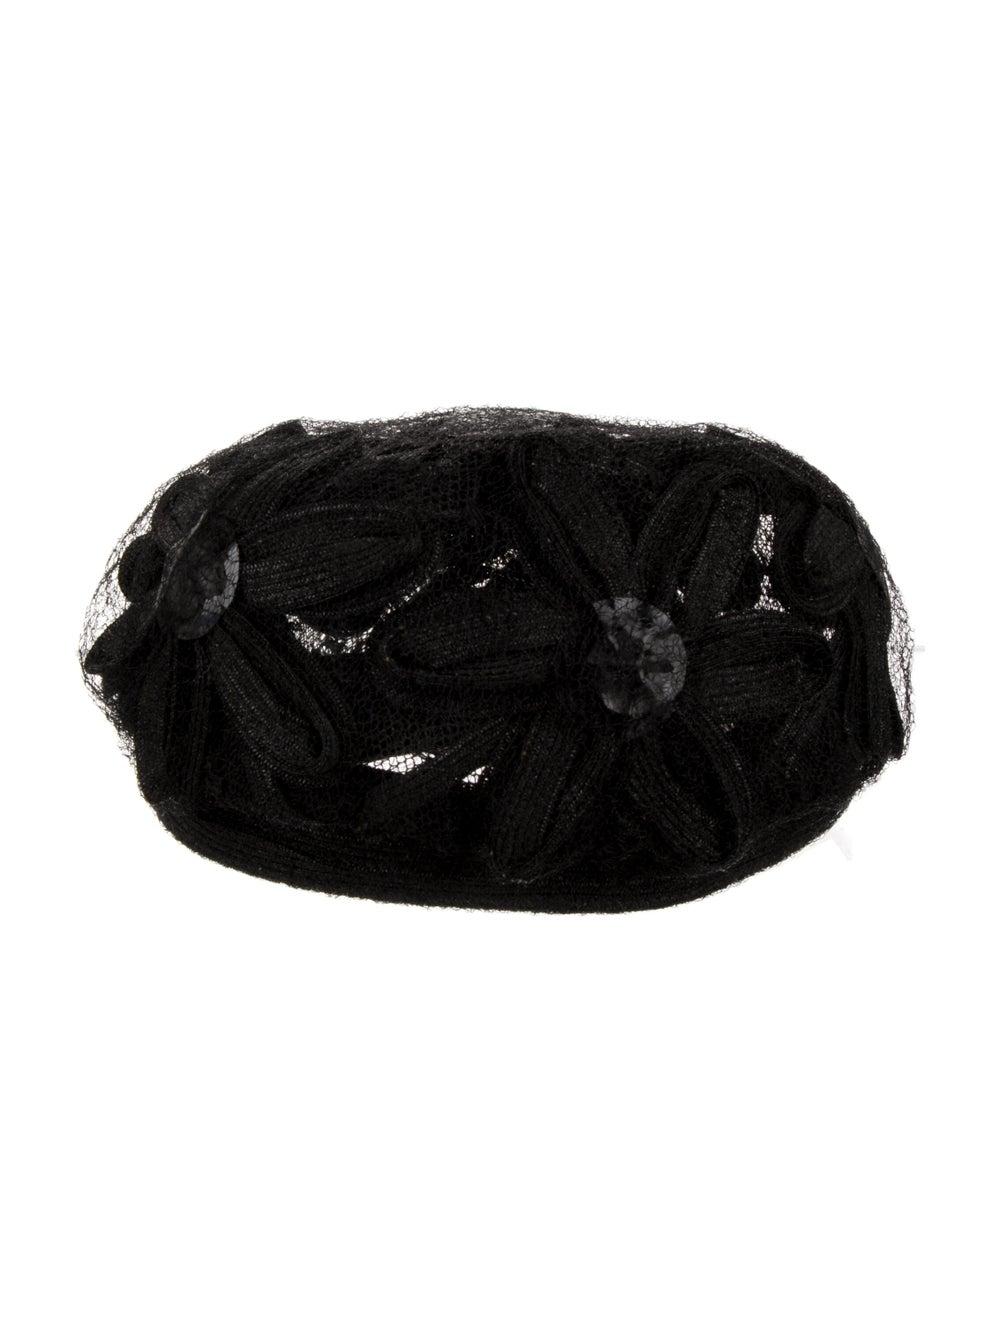 Christian Dior Lace Hat Black - image 1